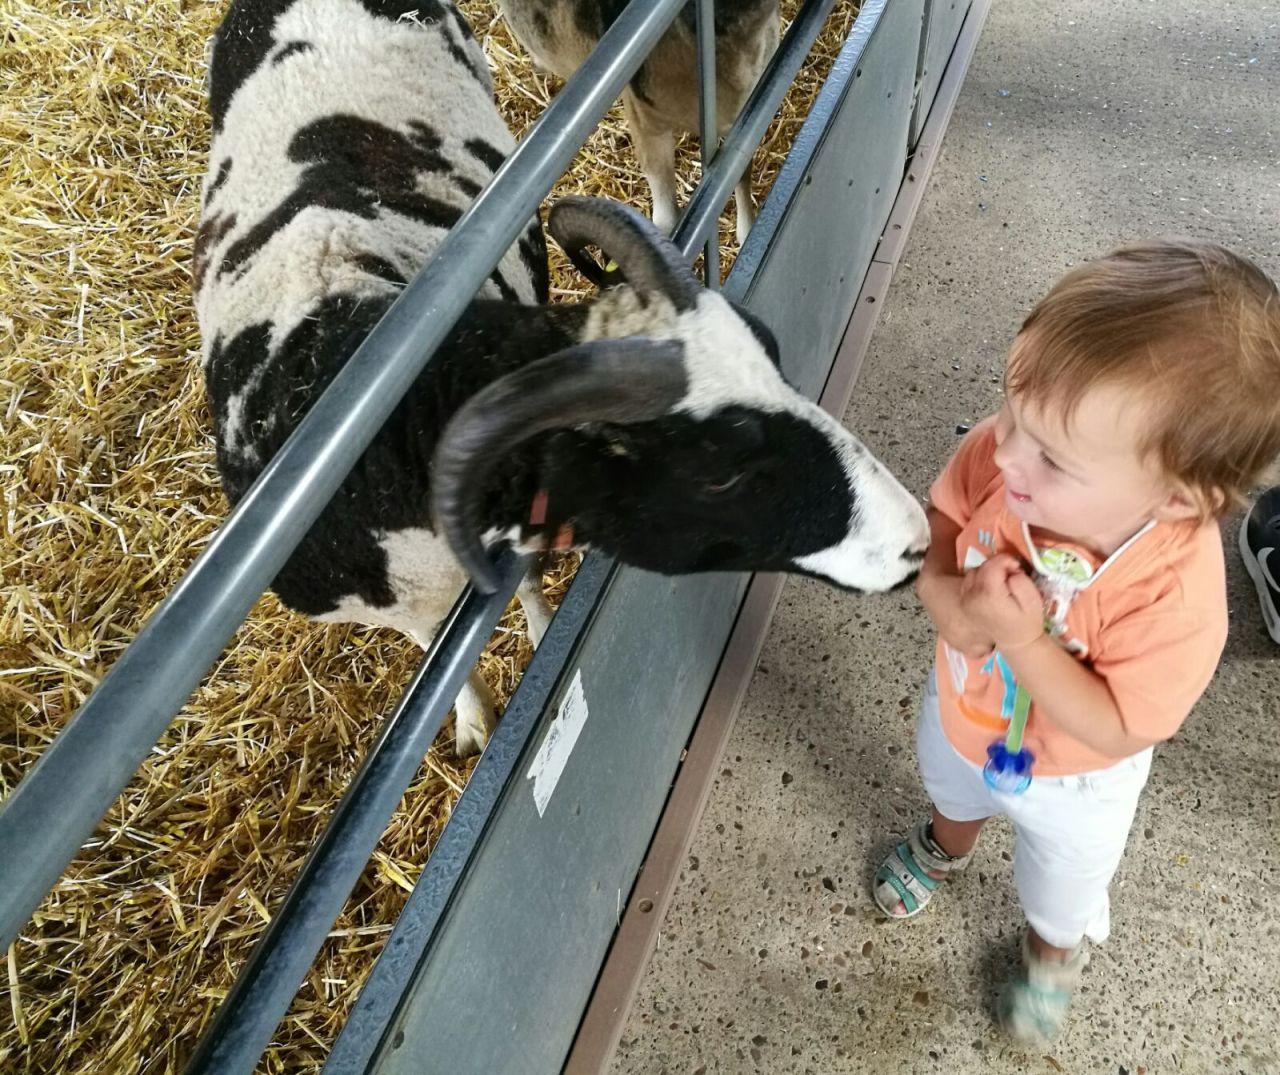 Odds farm dayout with kids: Jacob sheep & baby E